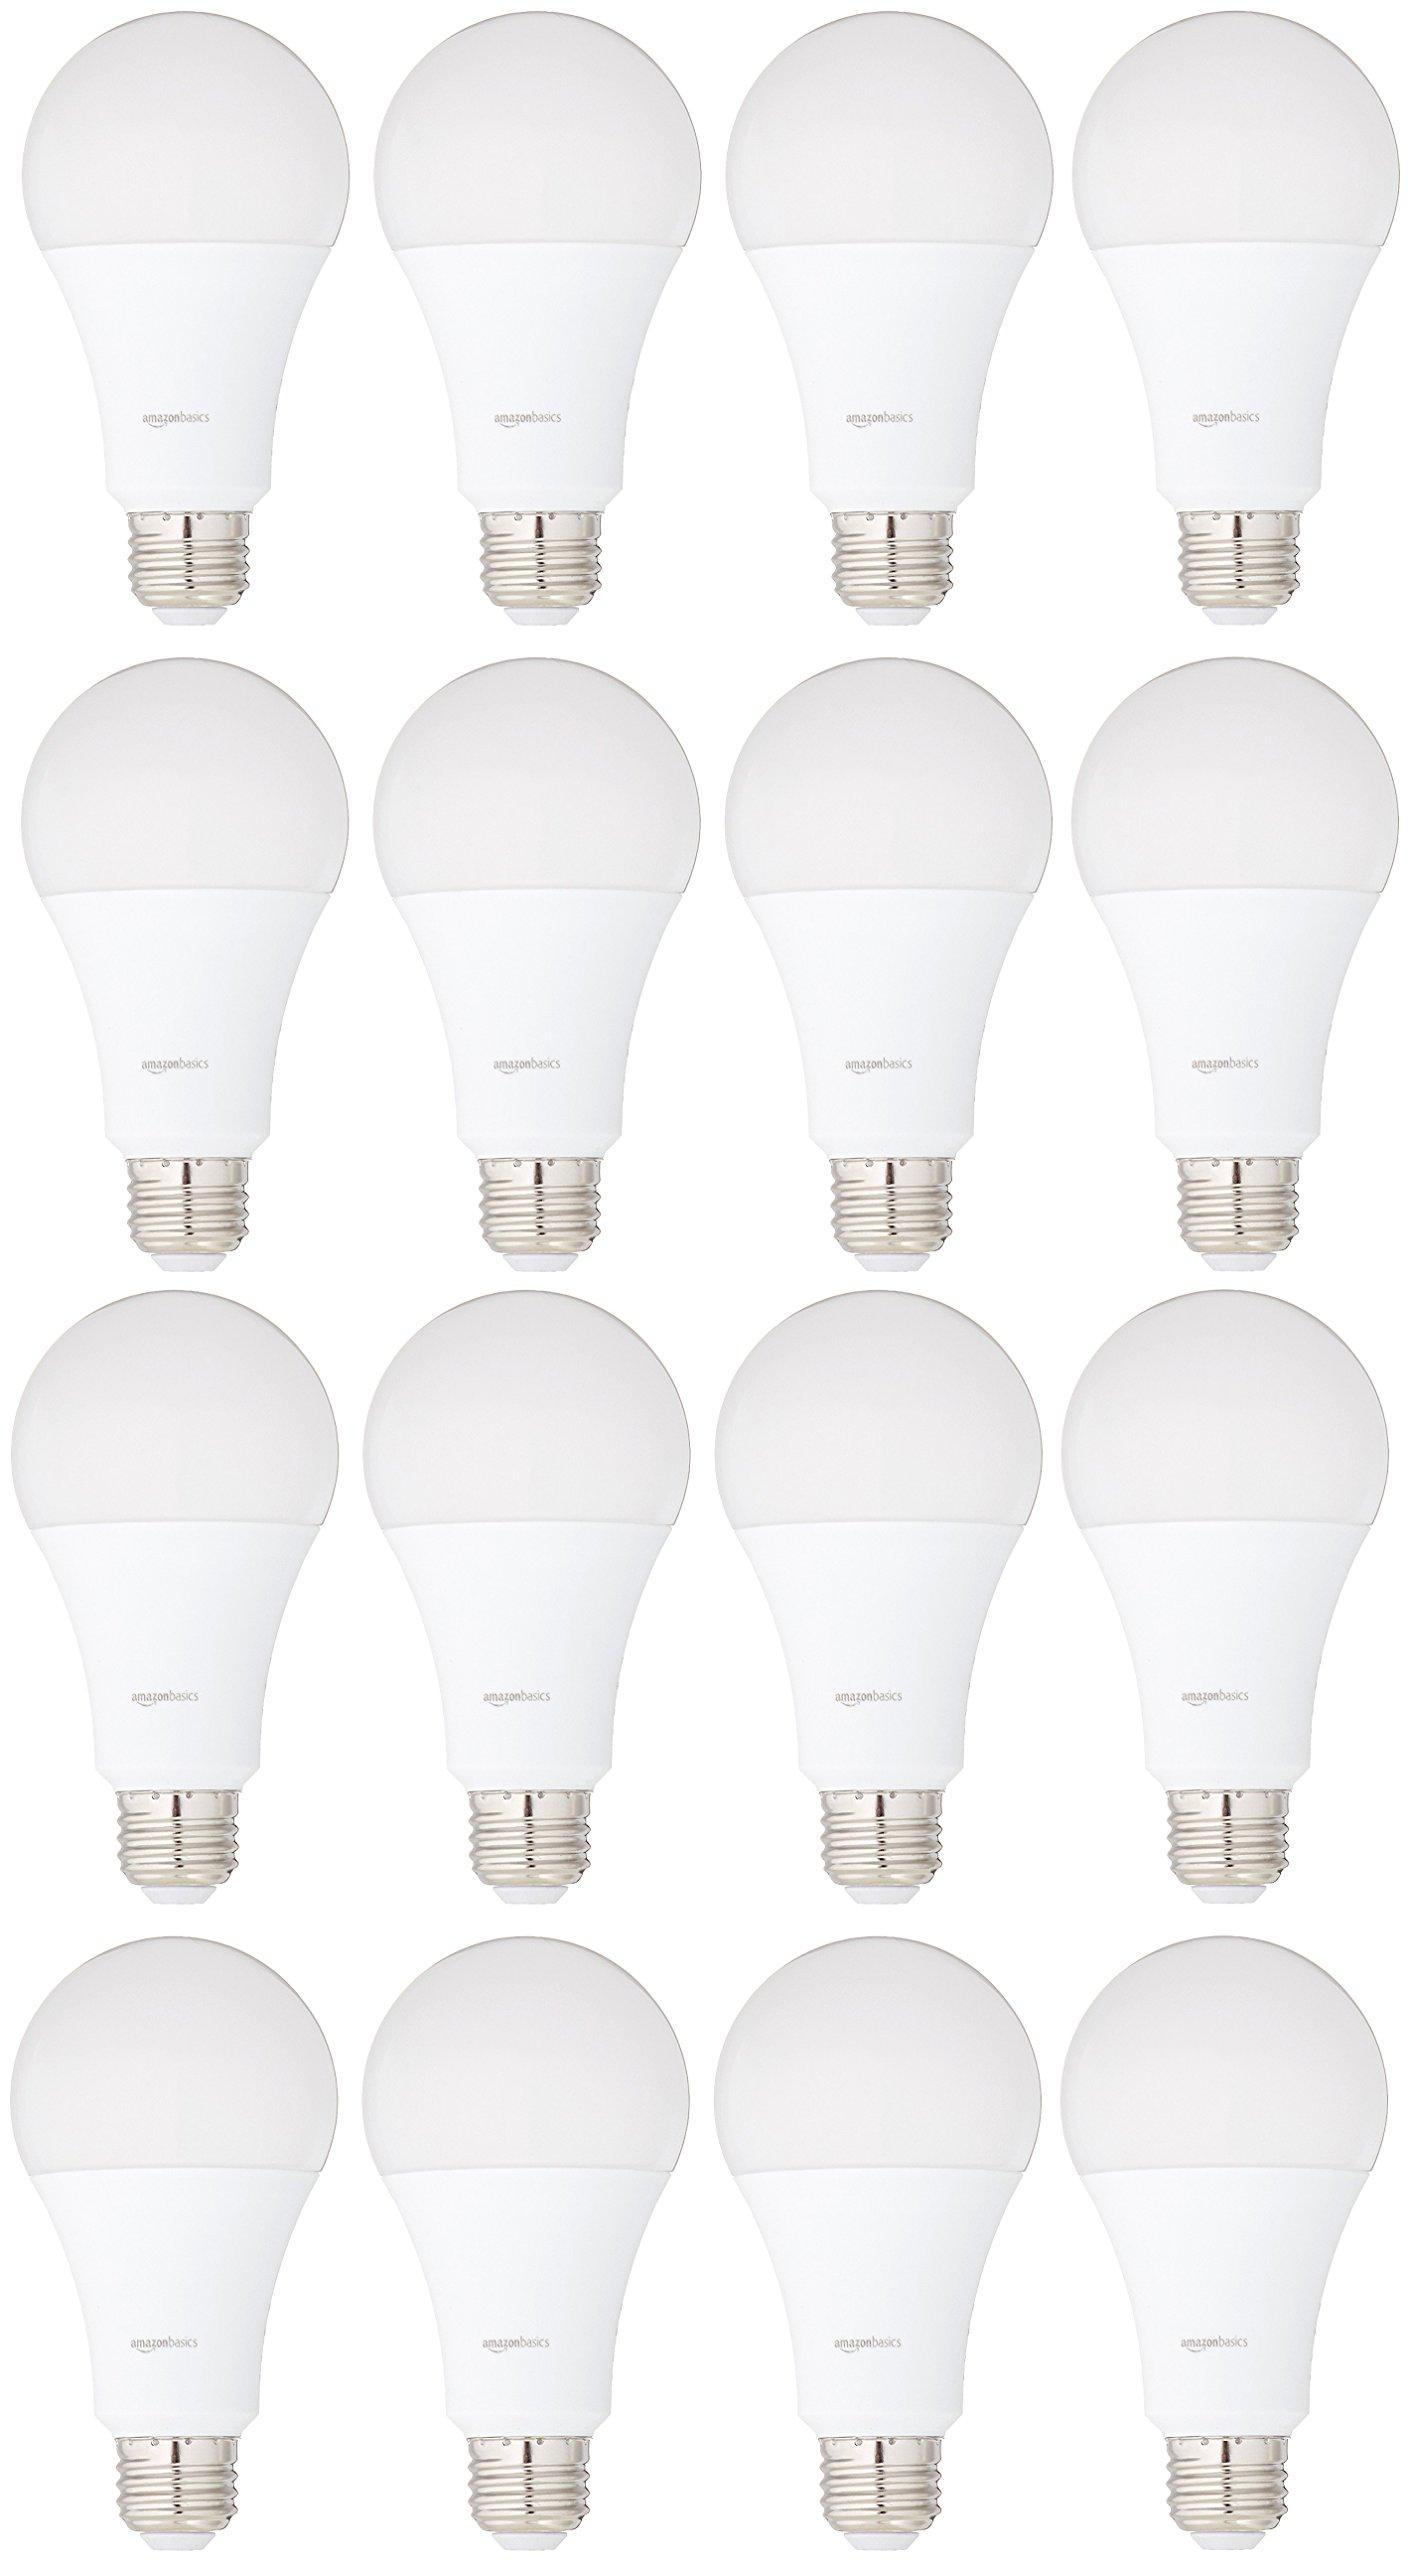 AmazonBasics 100 Watt Equivalent, Daylight, Non-Dimmable, A21 LED Light Bulb | 16-Pack